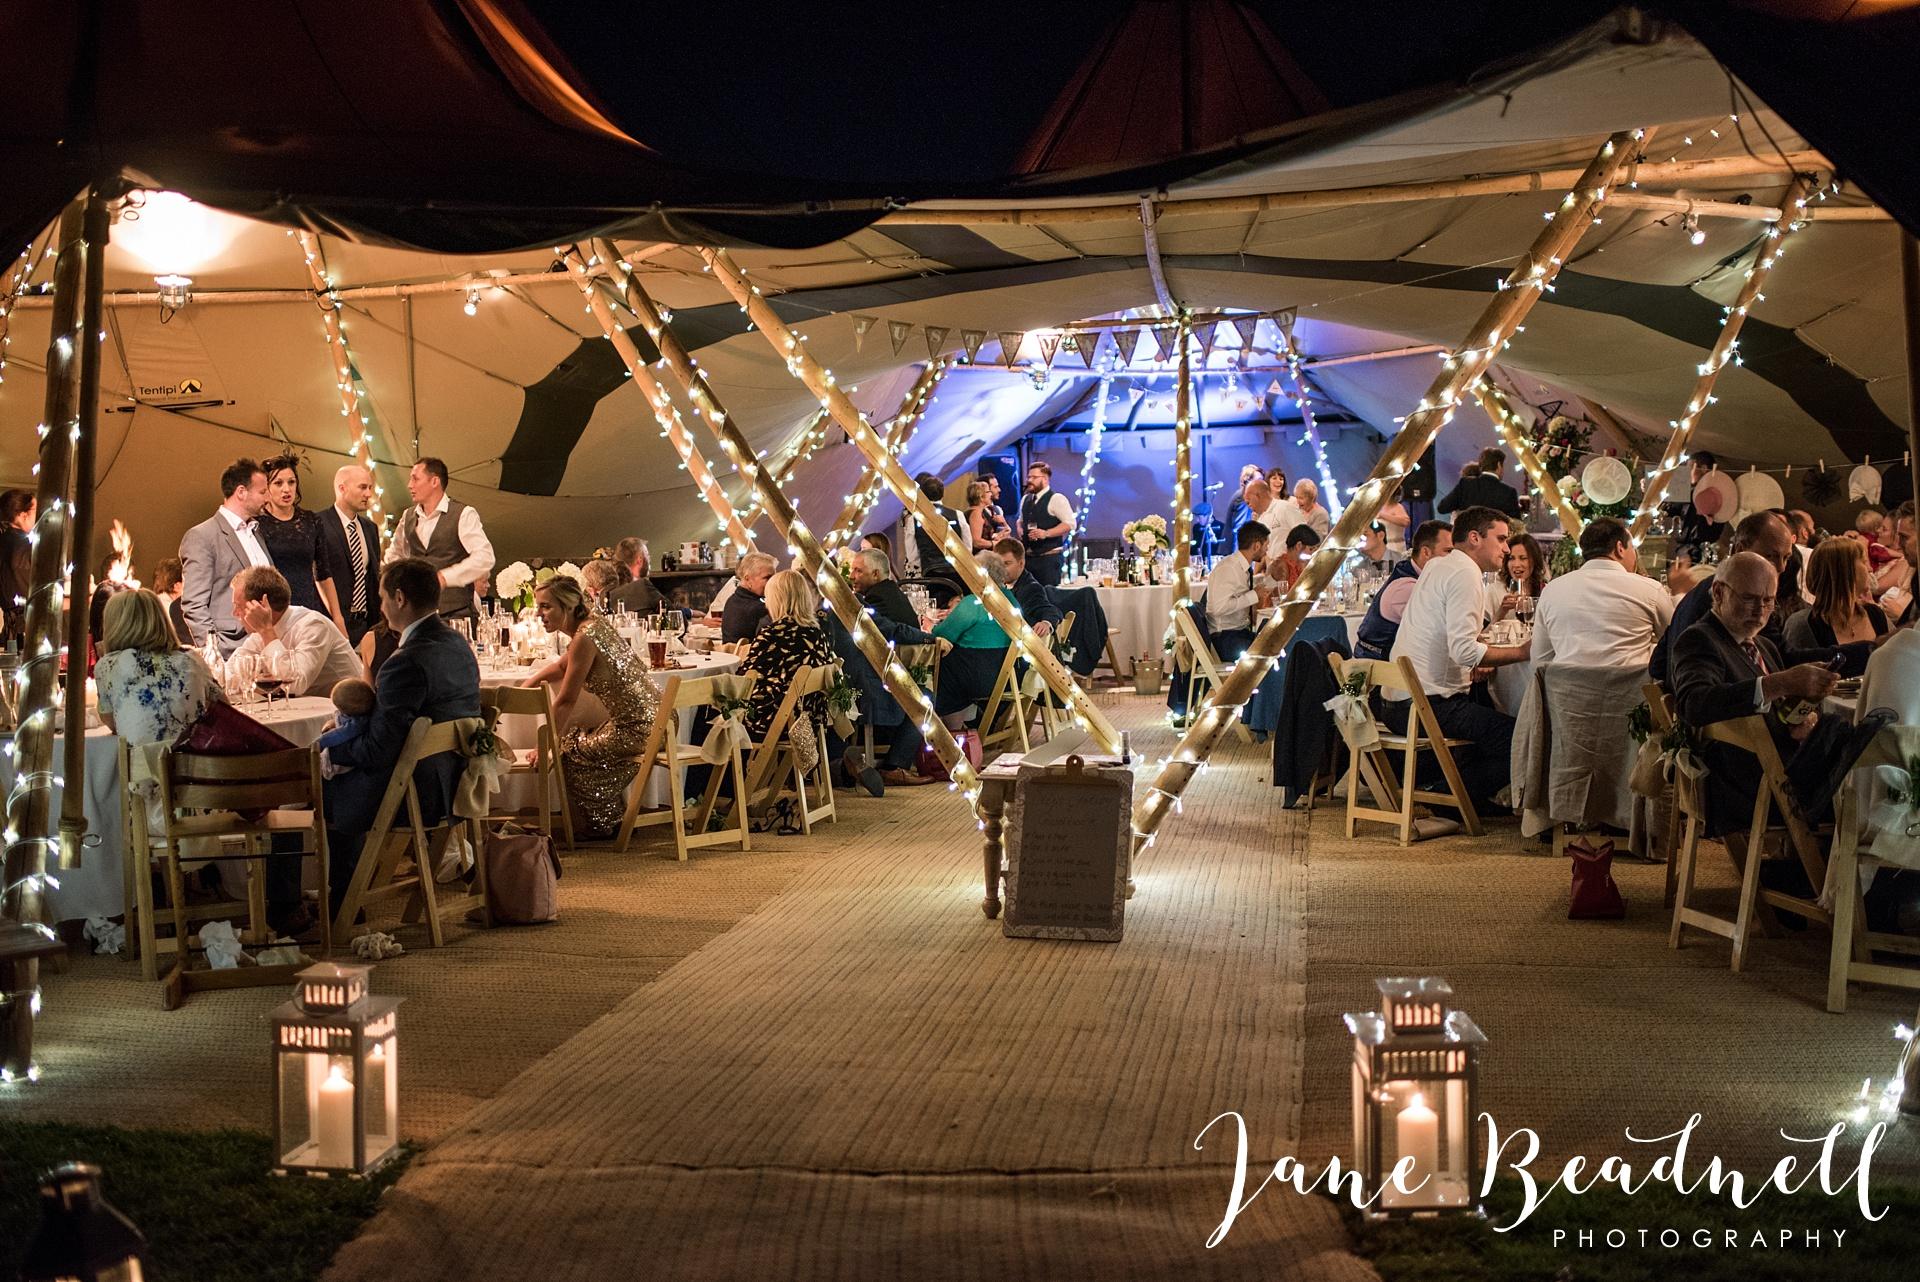 fine-art-wedding-photographer-jane-beadnell-yorkshire-wedding-photographer_0164